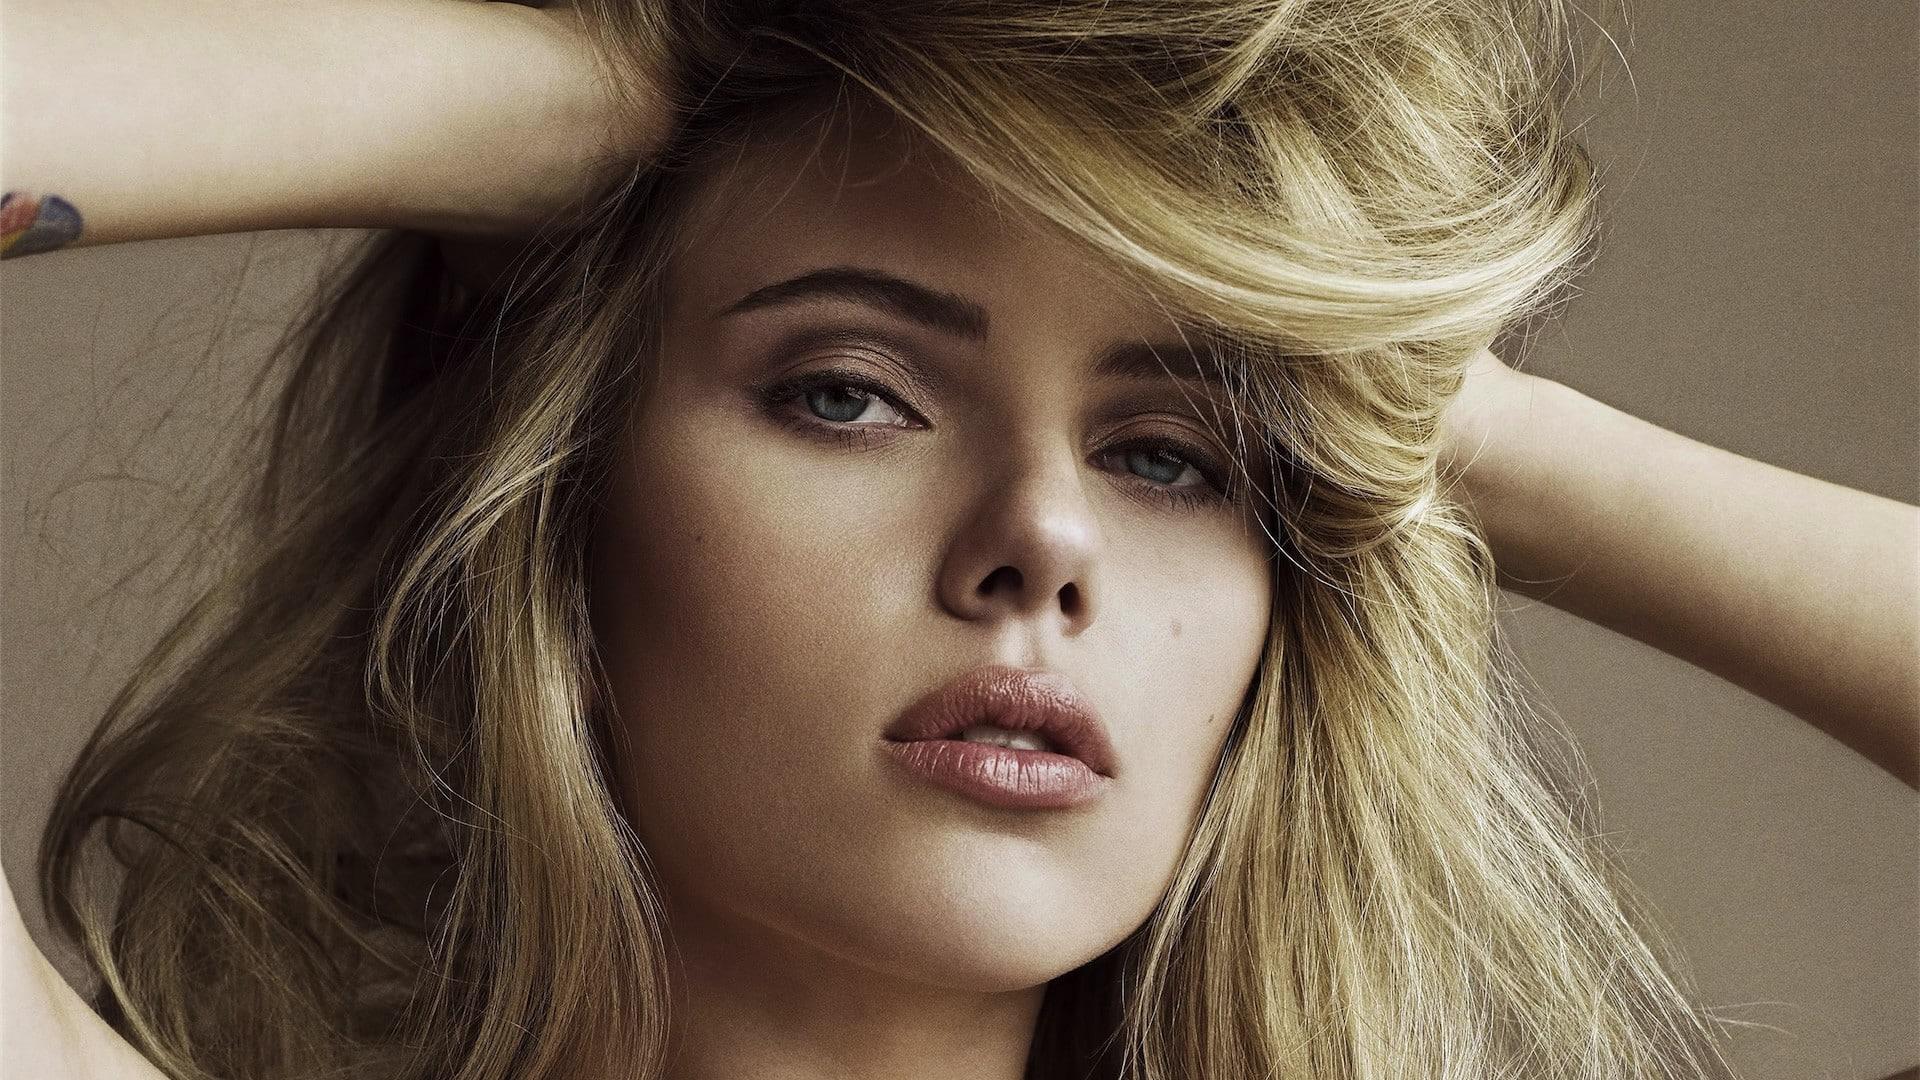 Scarlett Johansson Net worth, Age, Bio, Family, Height ...